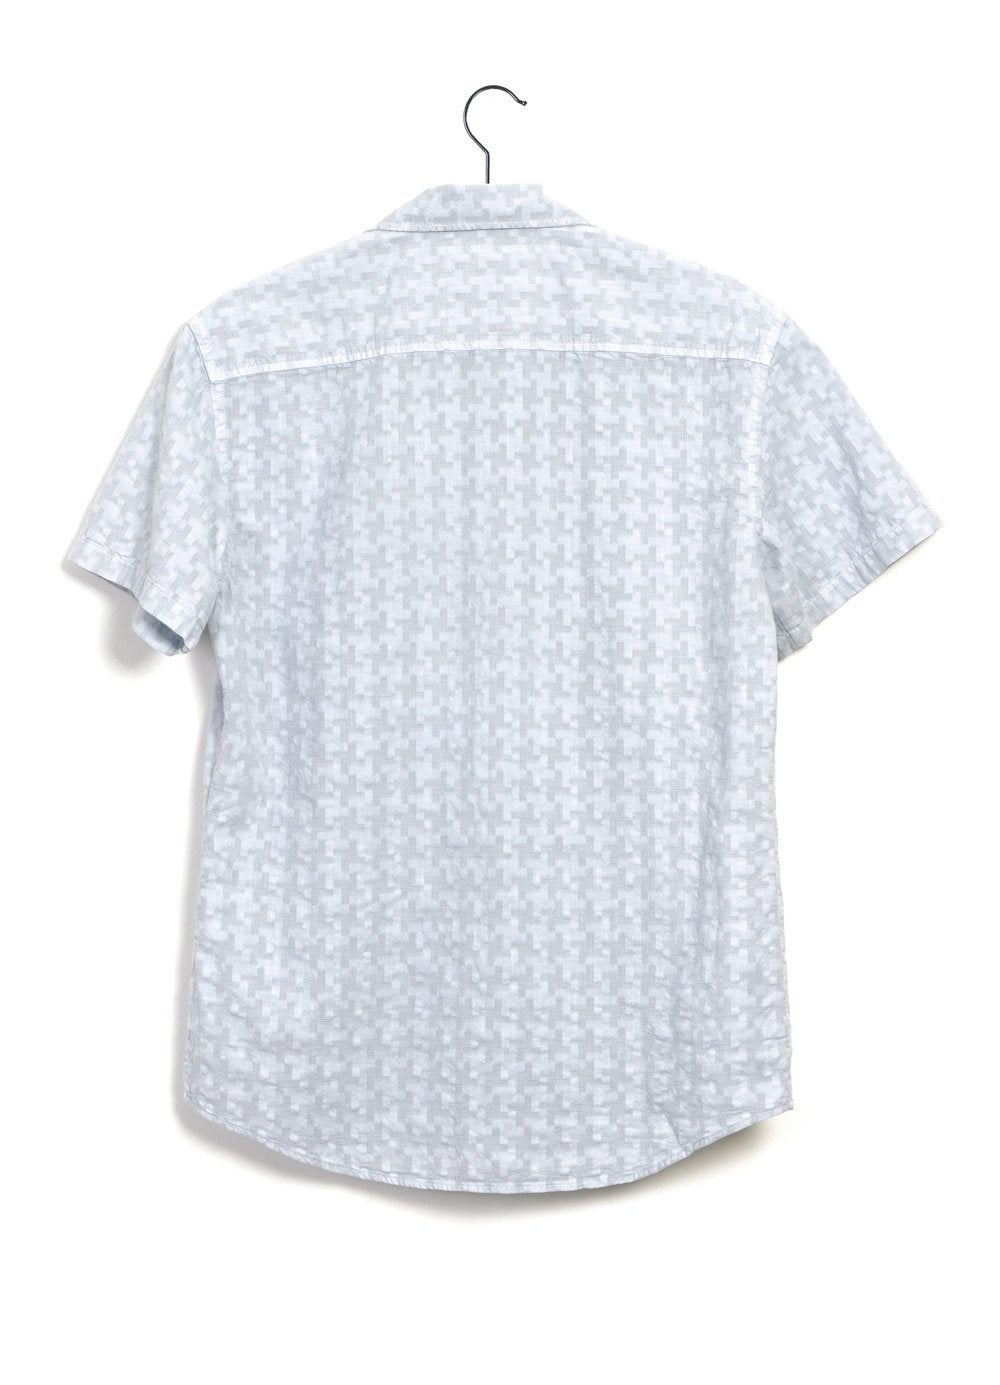 Hansen Garments JONNY | Short Sleeve Shirt | White, Aqua